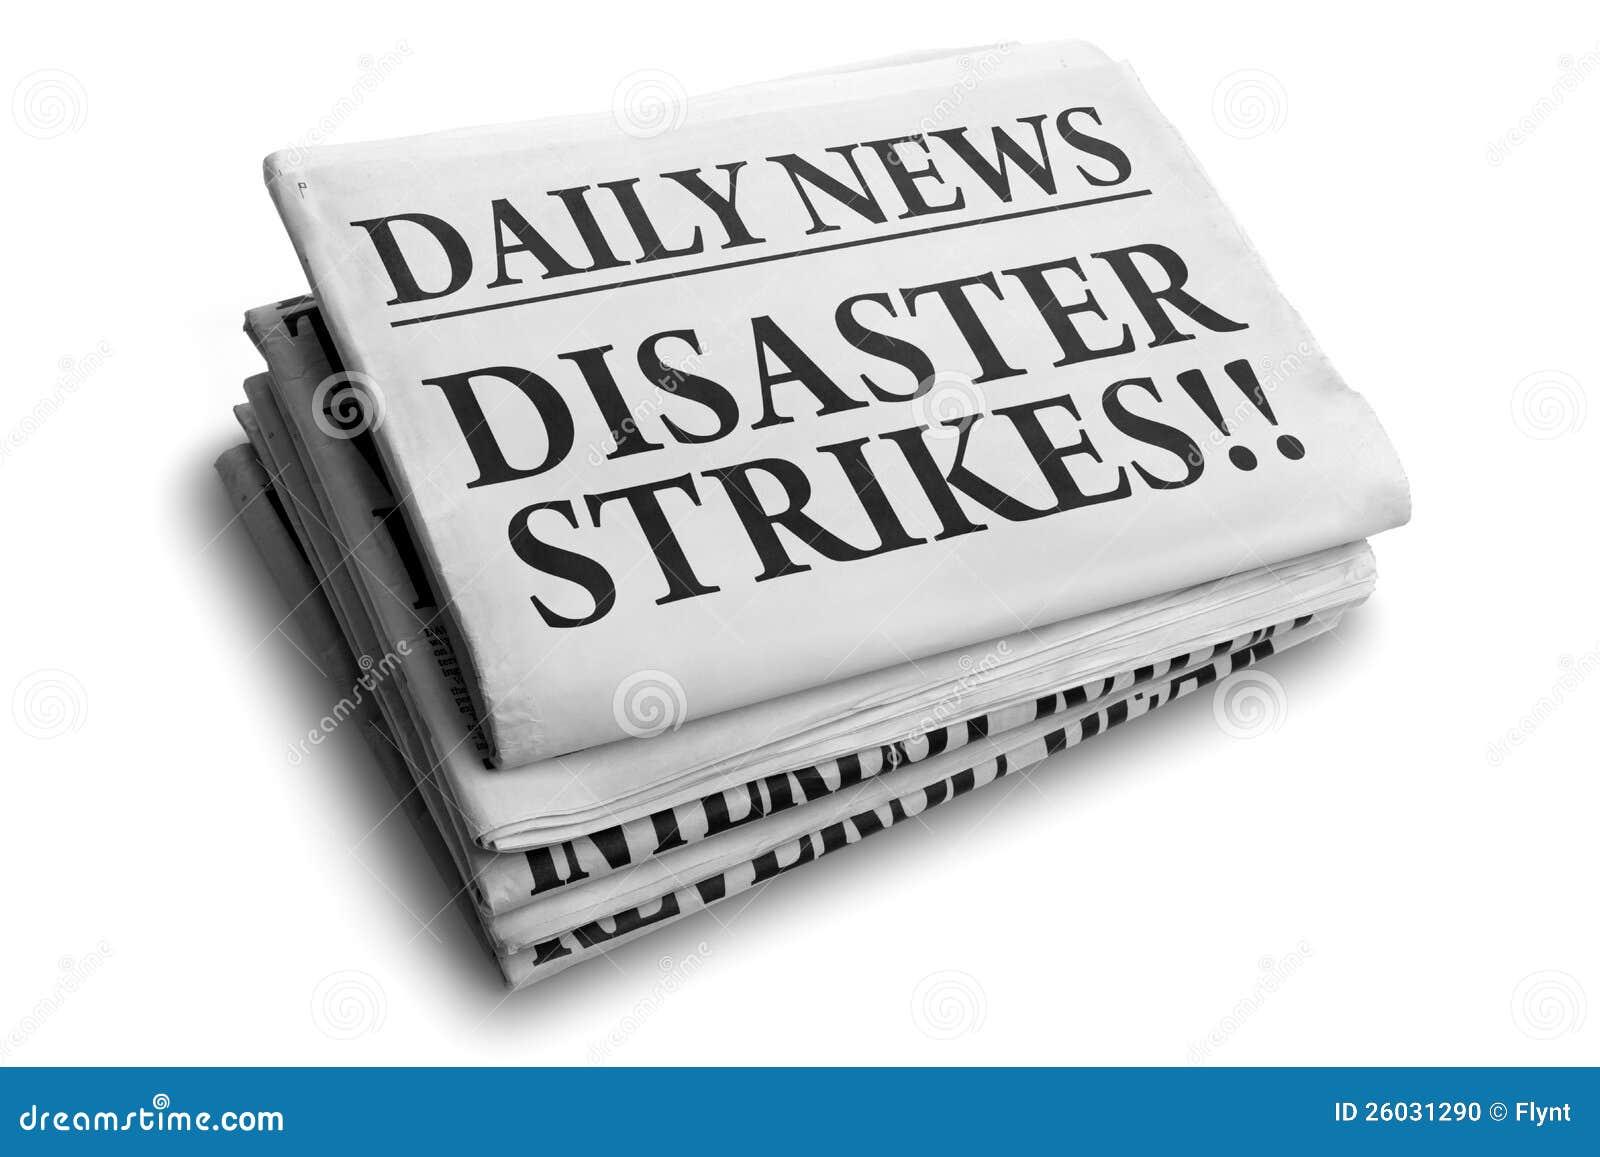 Disaster strikes daily newspaper headline